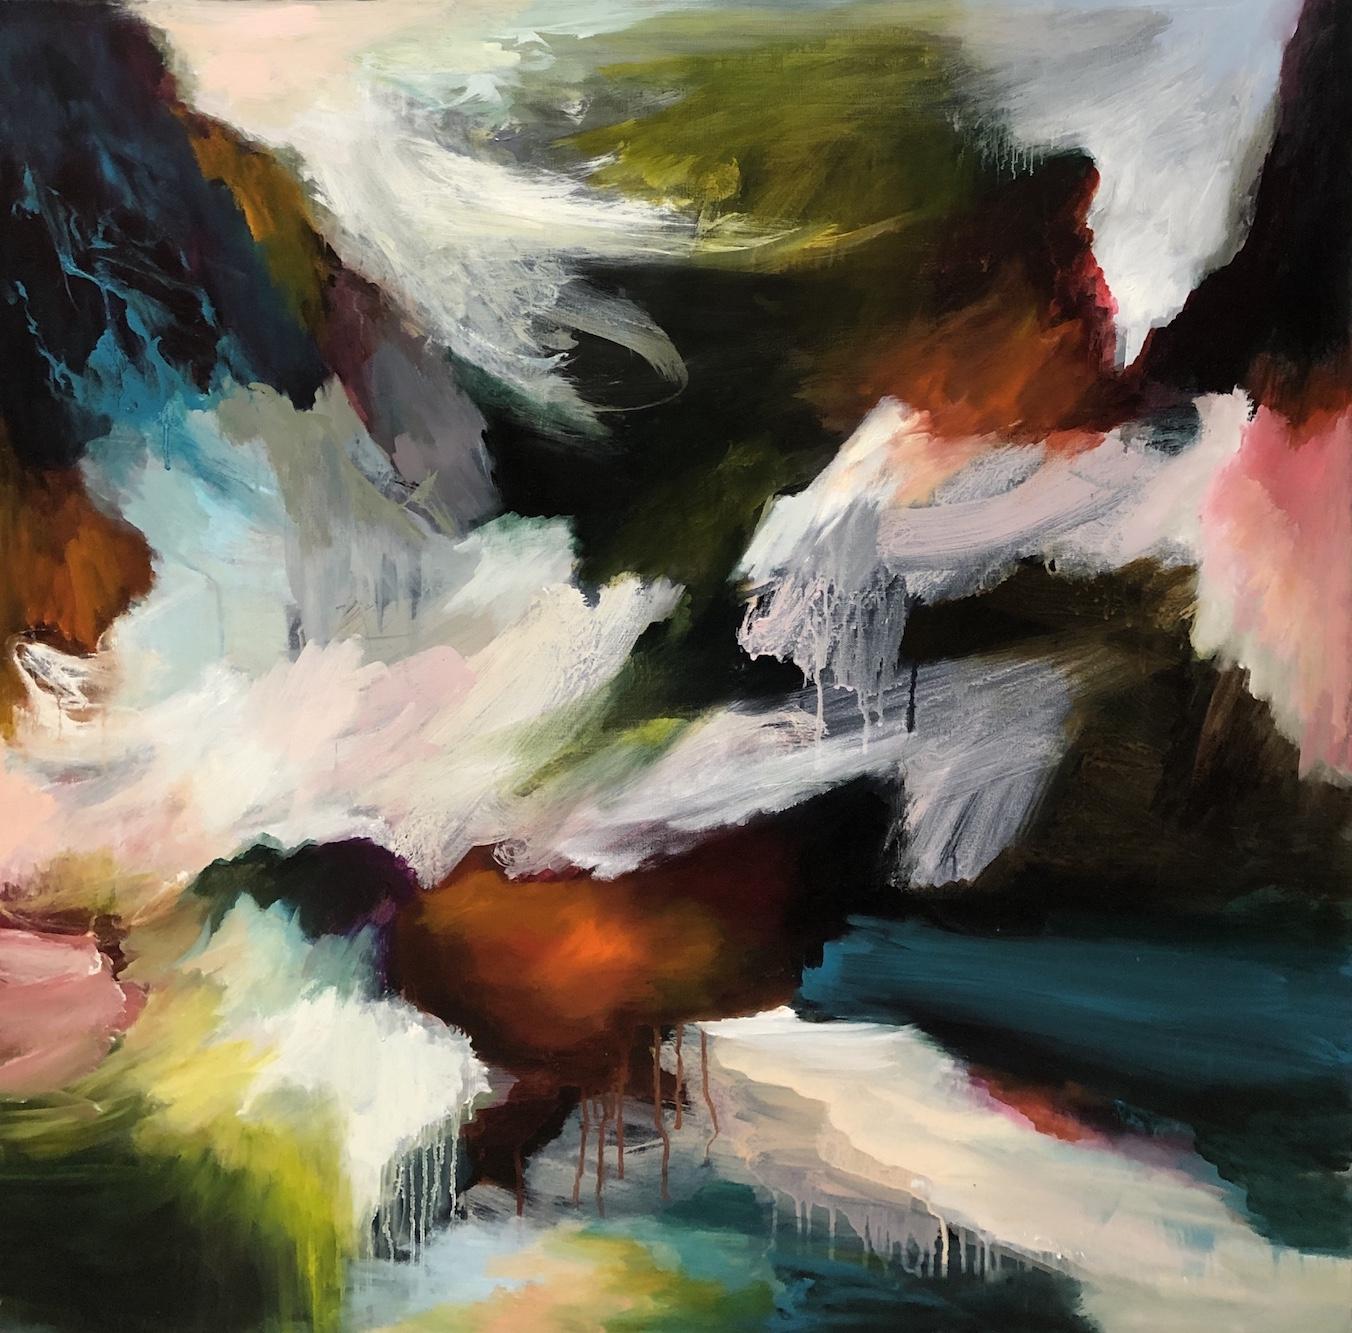 Lydia Miller Coastal Lands 2018 oil on canvas 91x91cm $2200.00